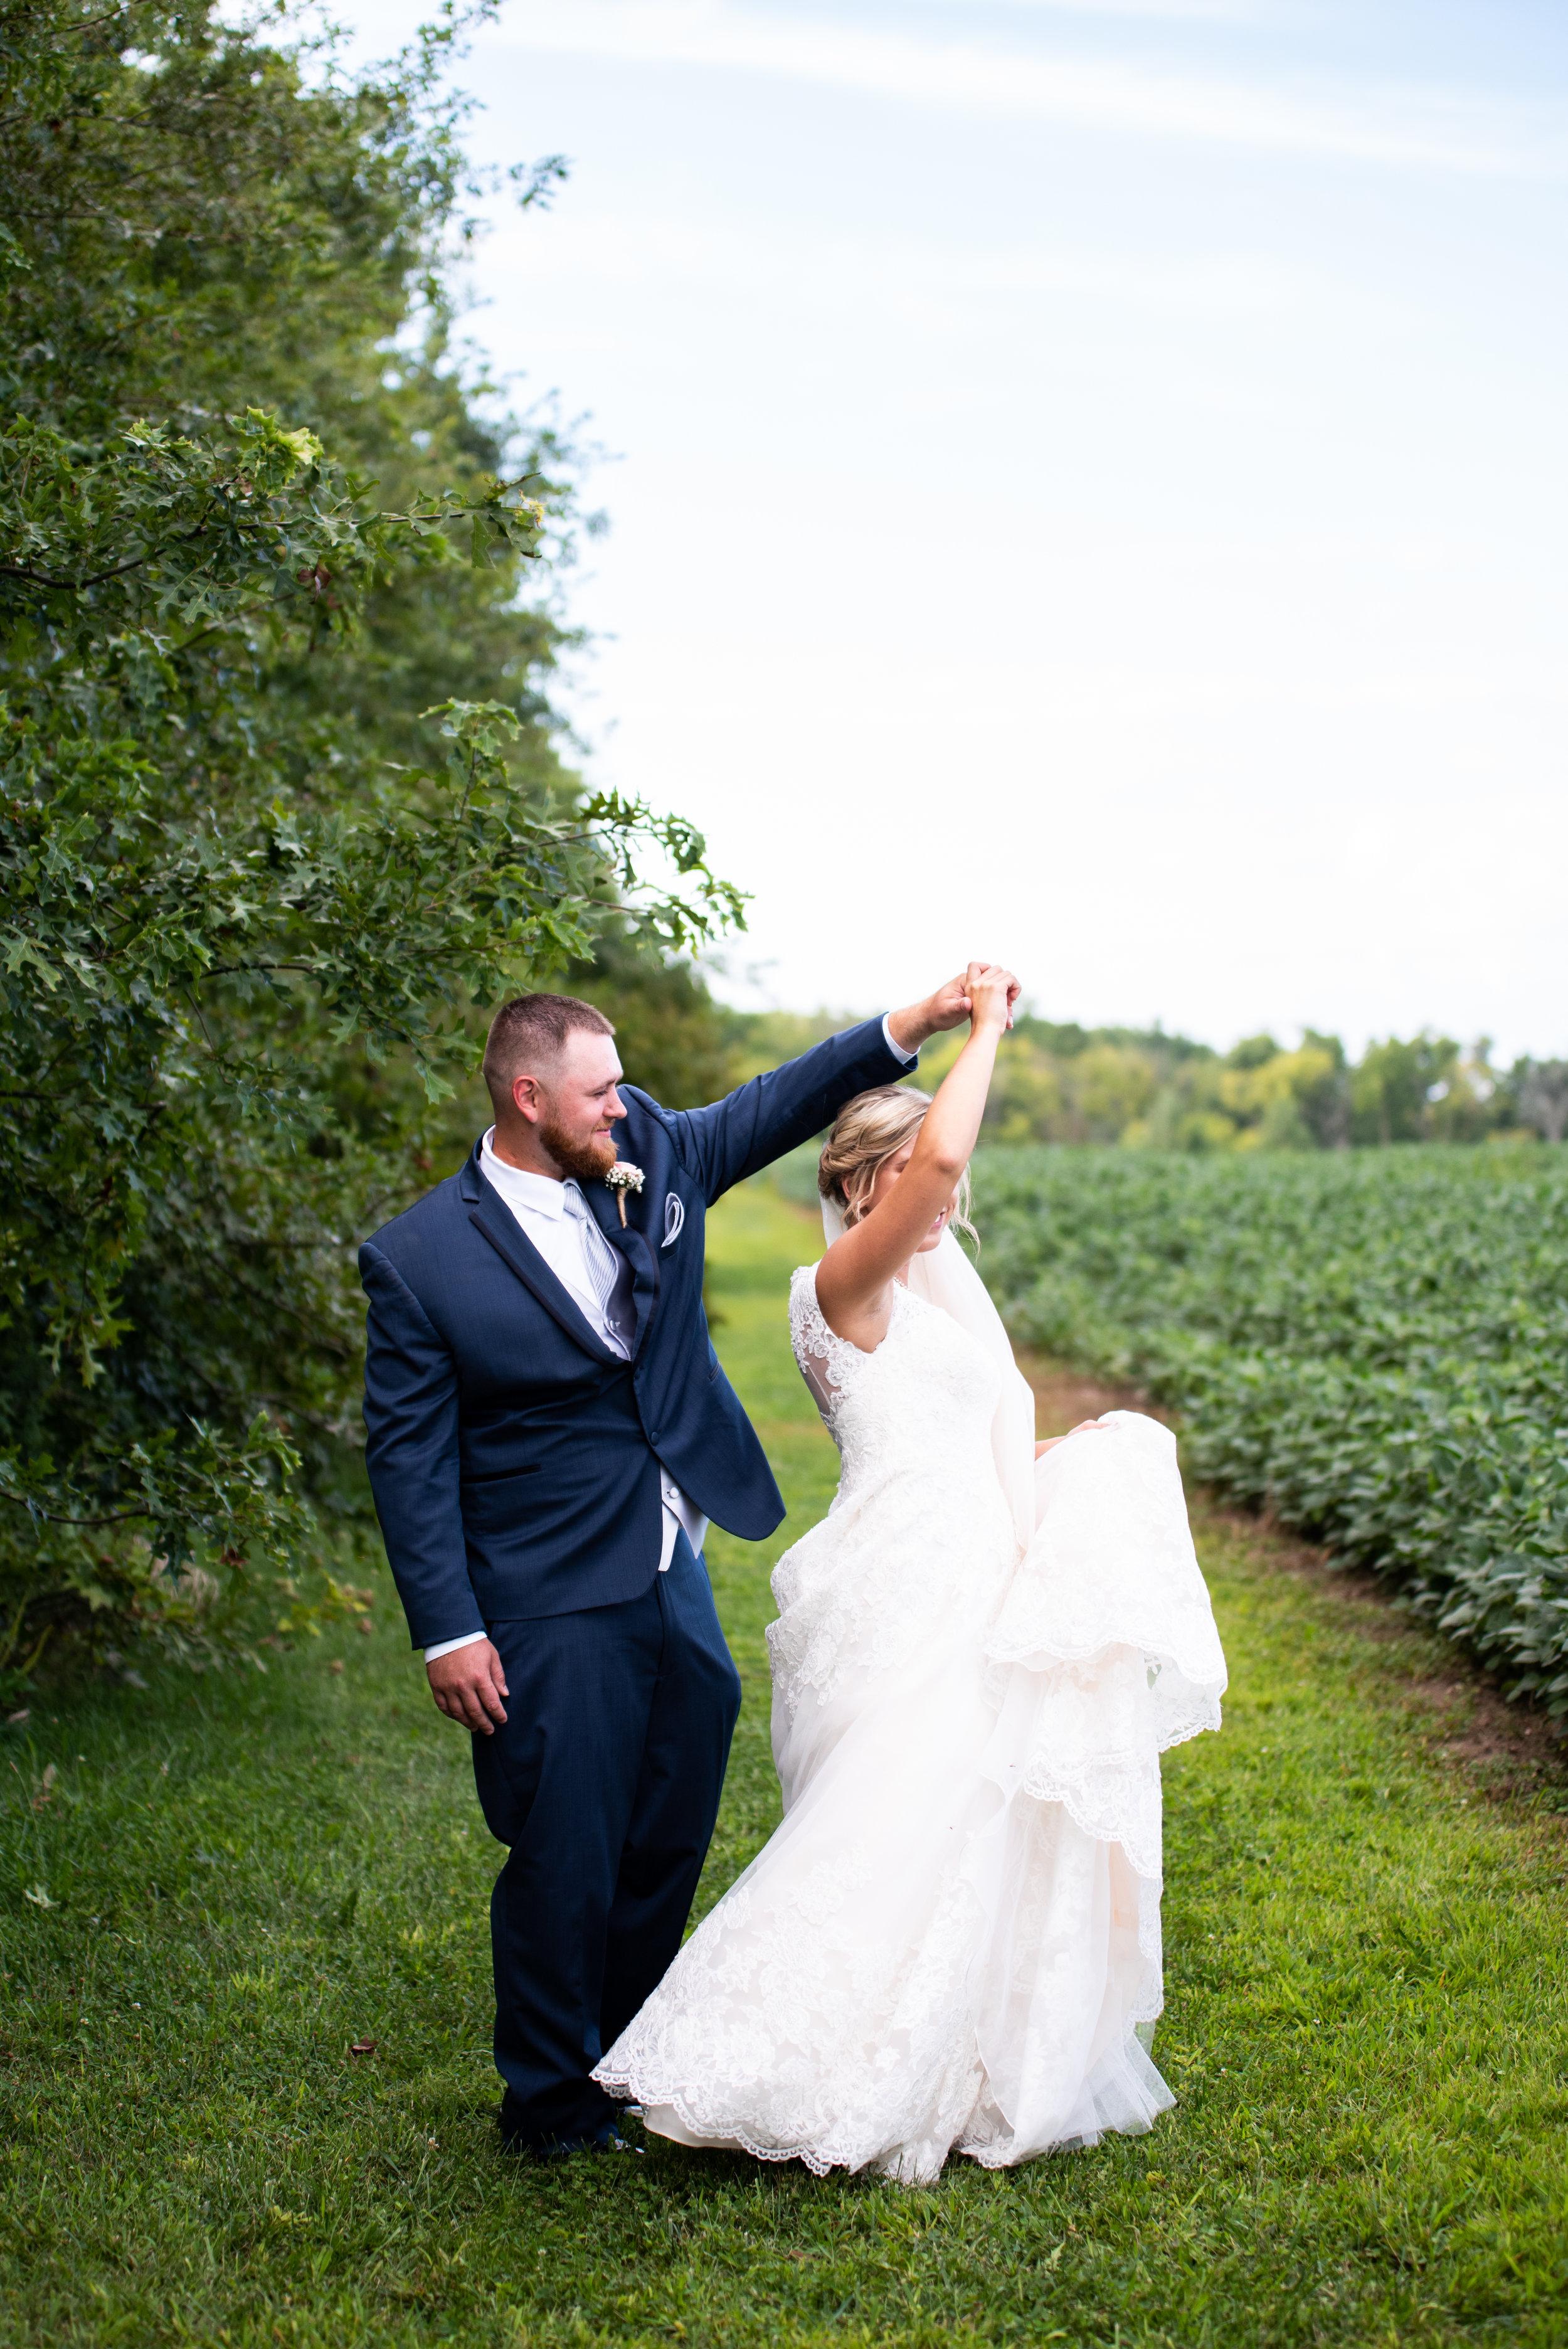 wedding (1 of 1)-167.jpg